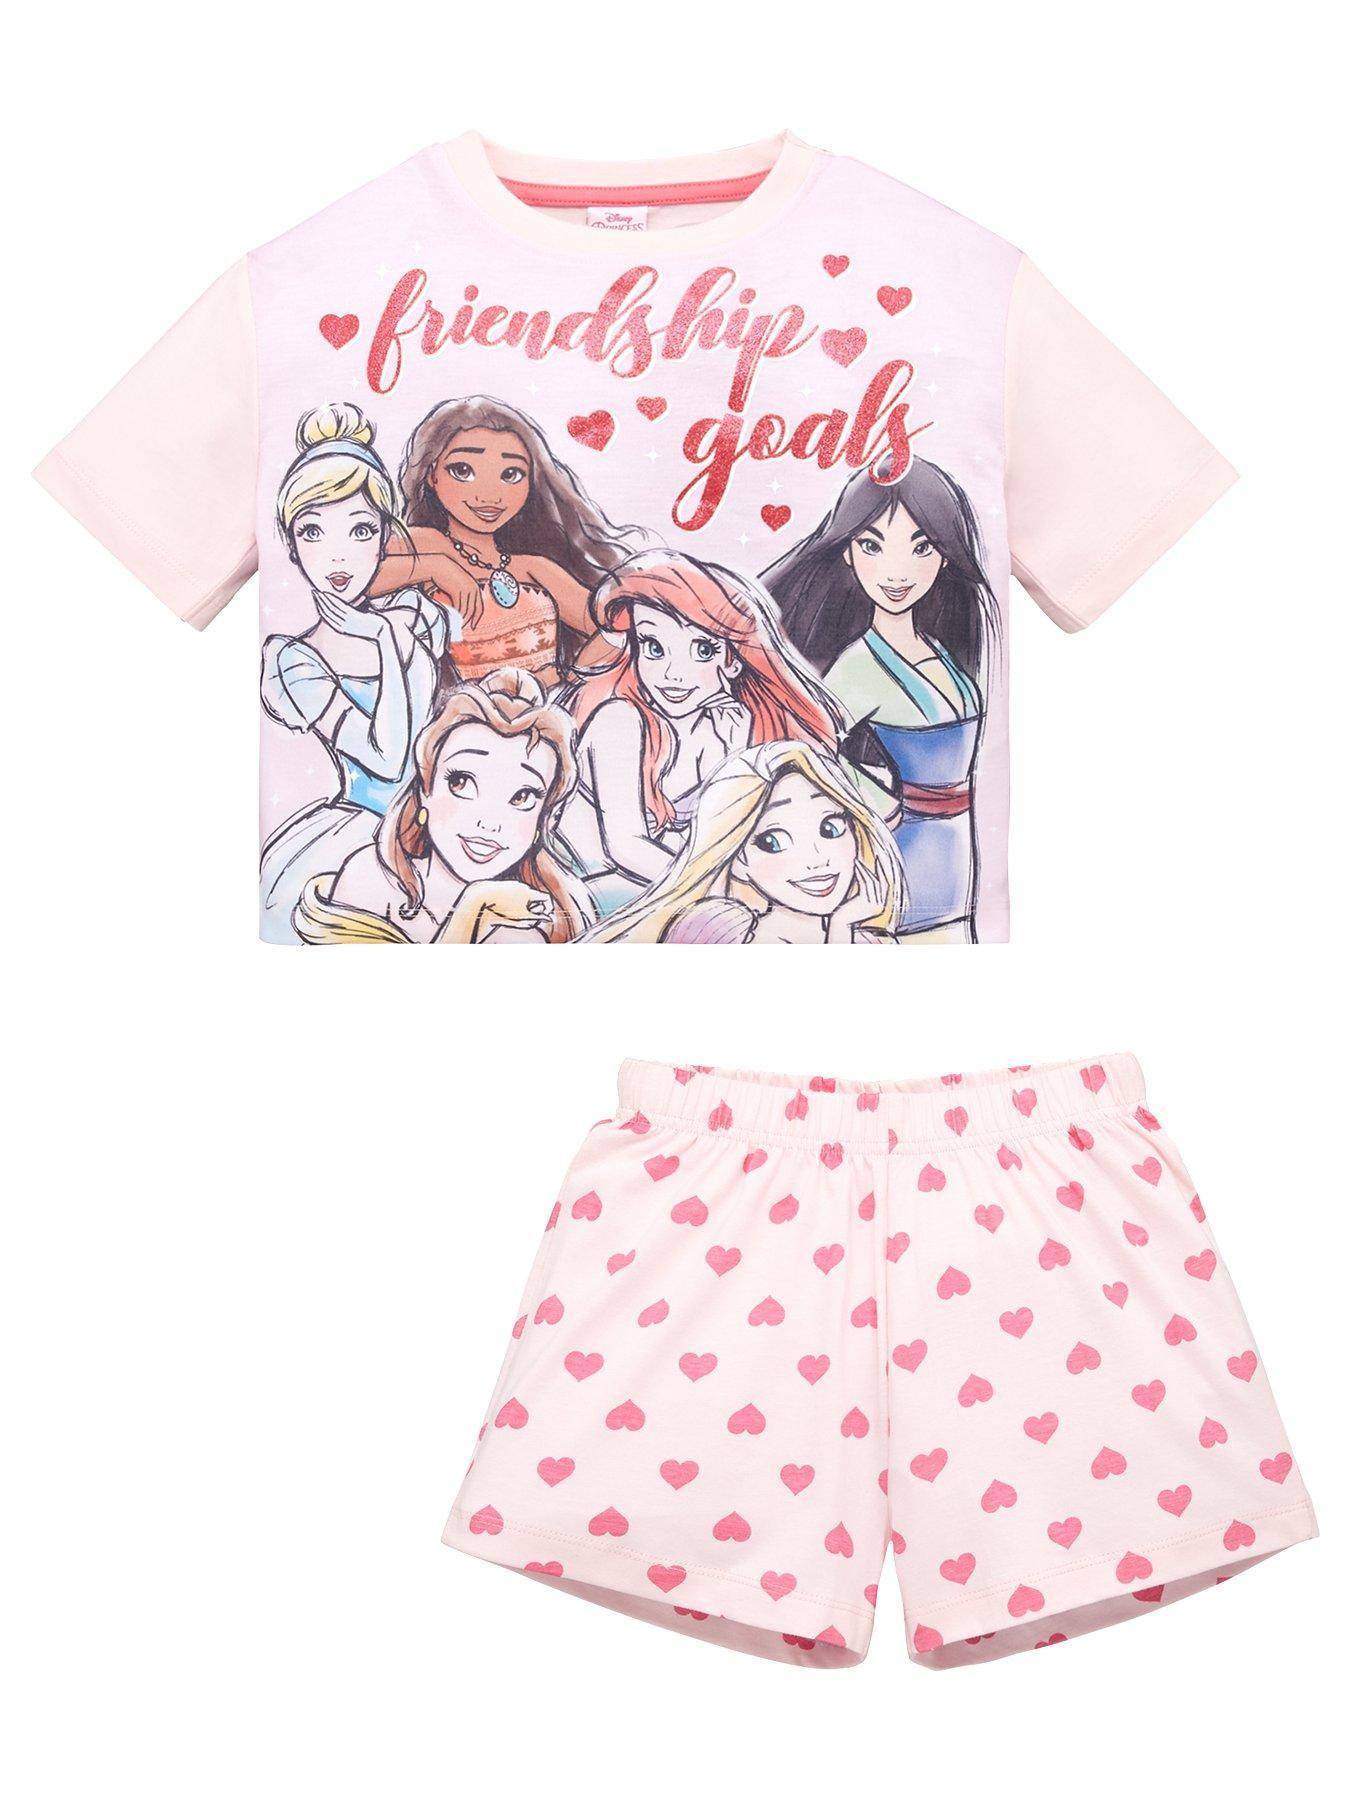 Girls Top Uk High Street Unicorn Pyjama Set Shortie Pyjamas Cotton M S L Age